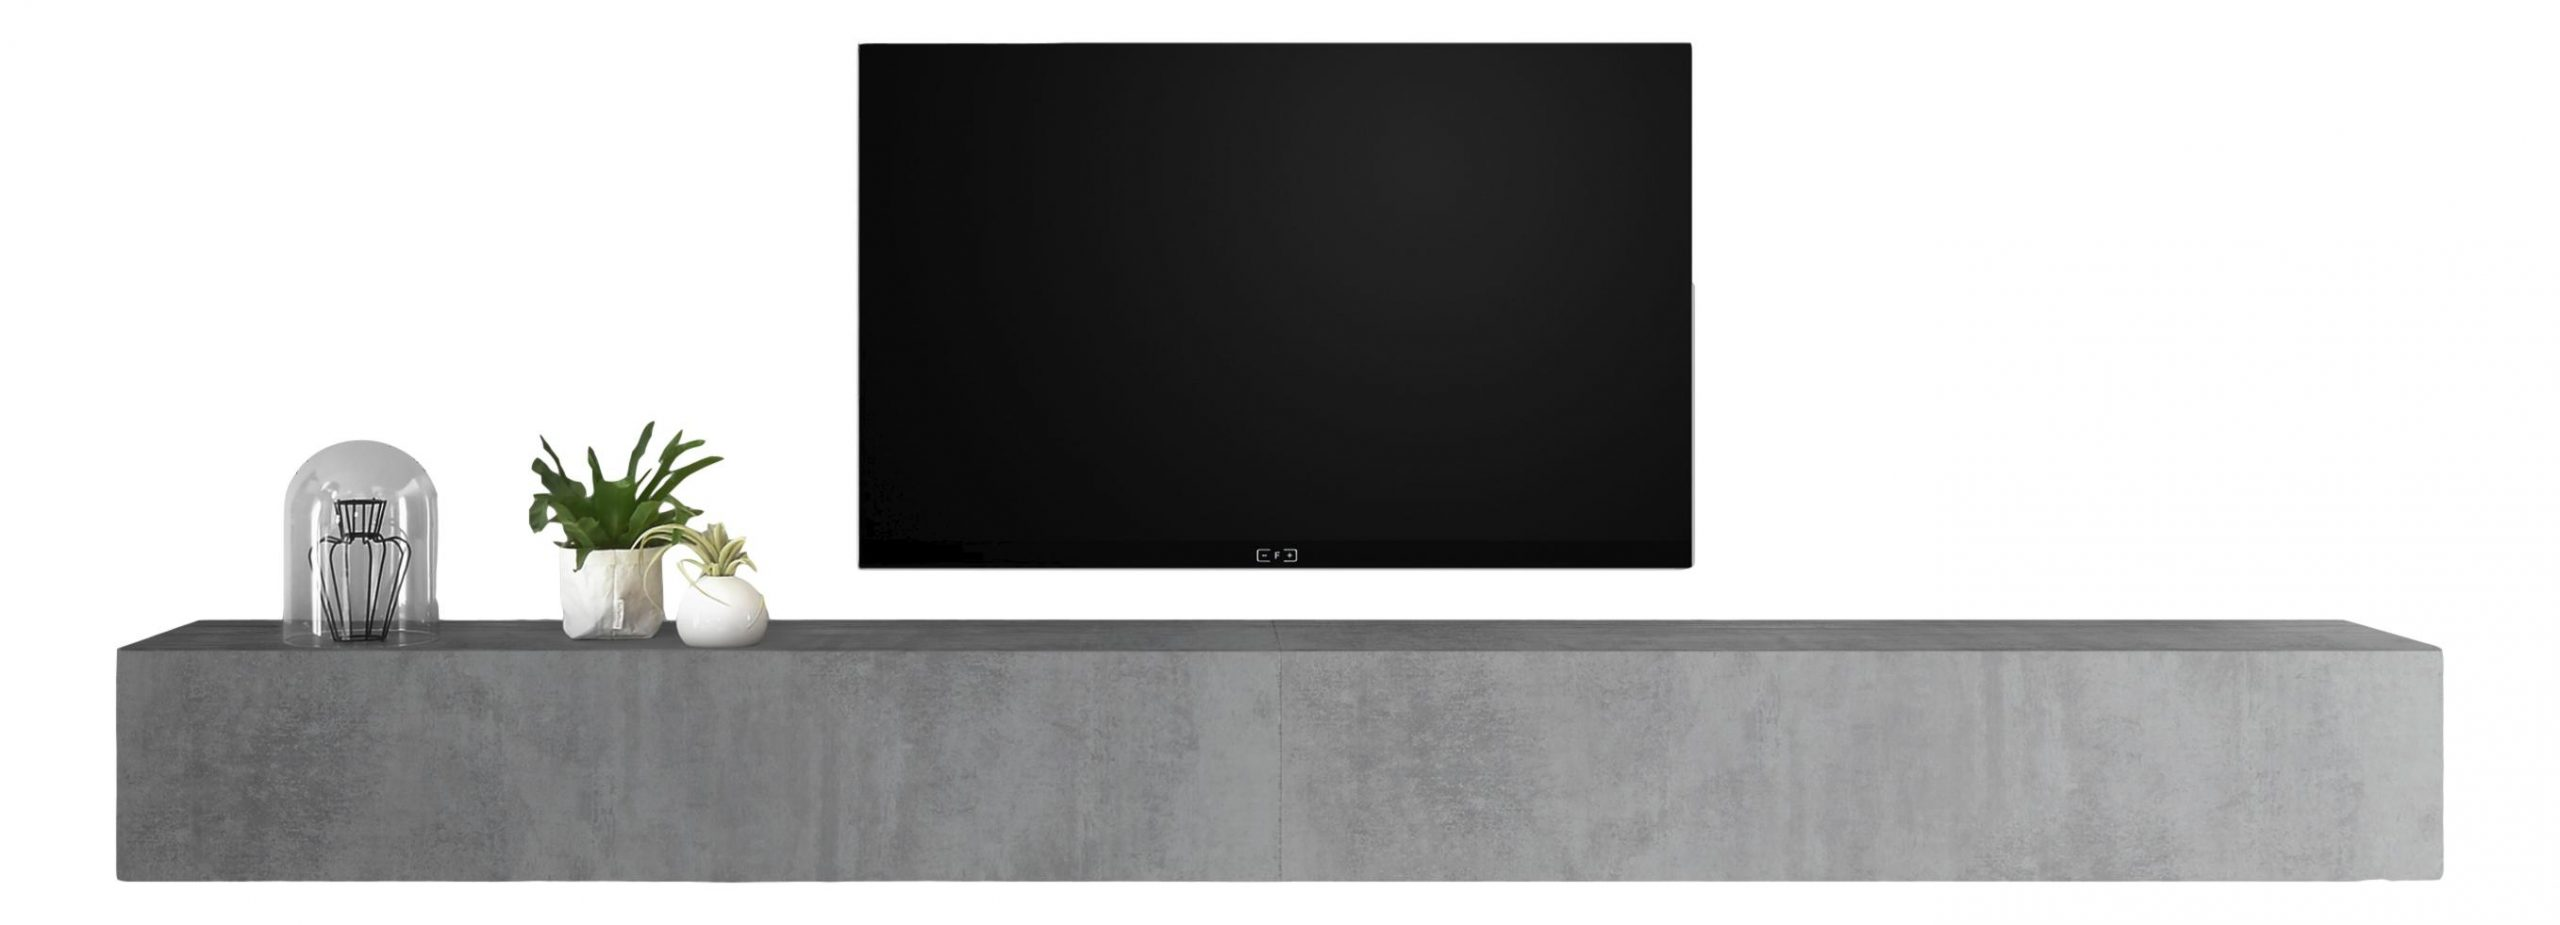 Zwevend Tv-meubel Tesla 276 cm breed in grijs beton | Pesaro Mobilia